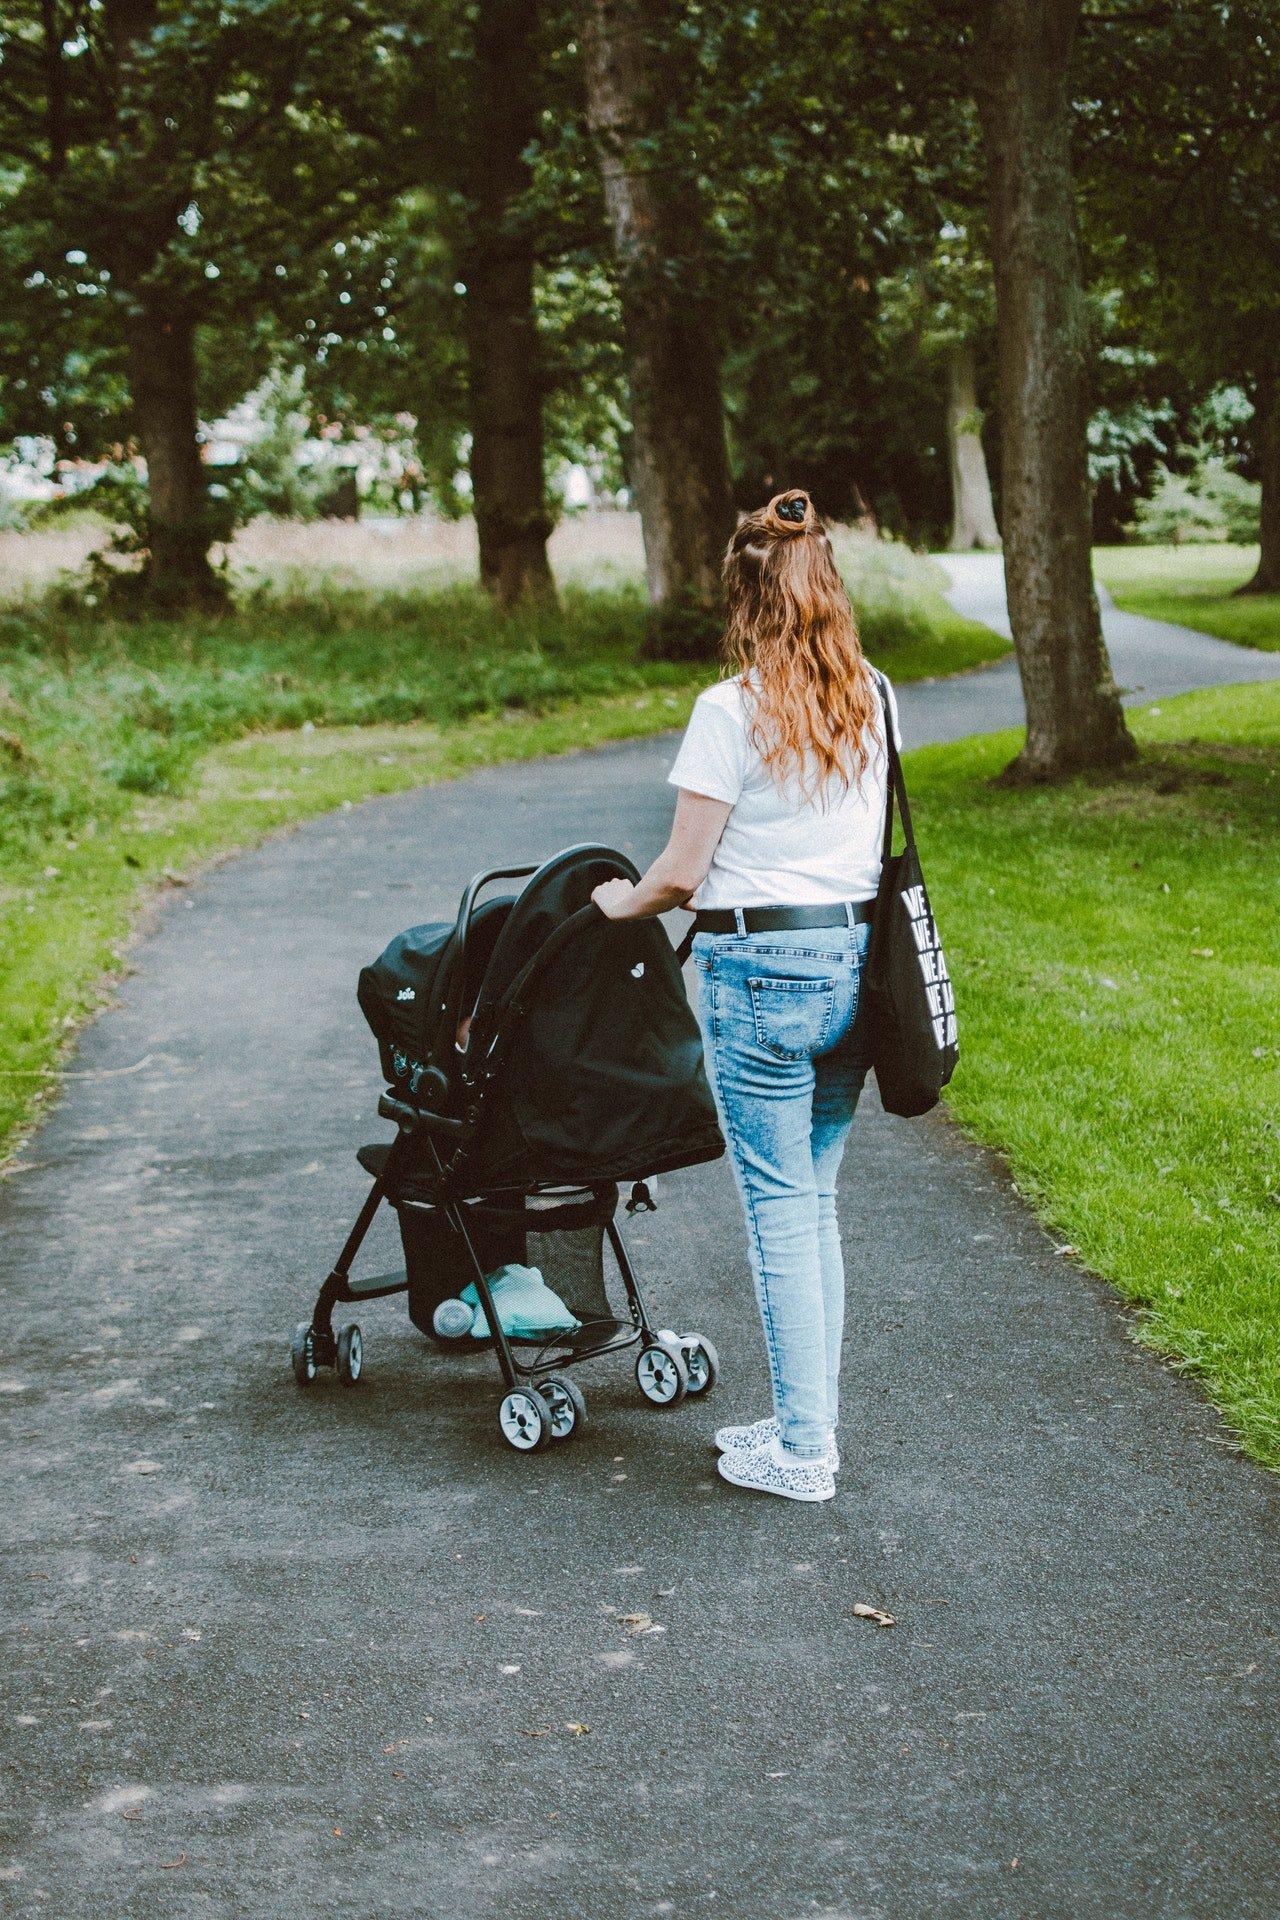 Mia left the house to run a few errands.   Source: Pexels